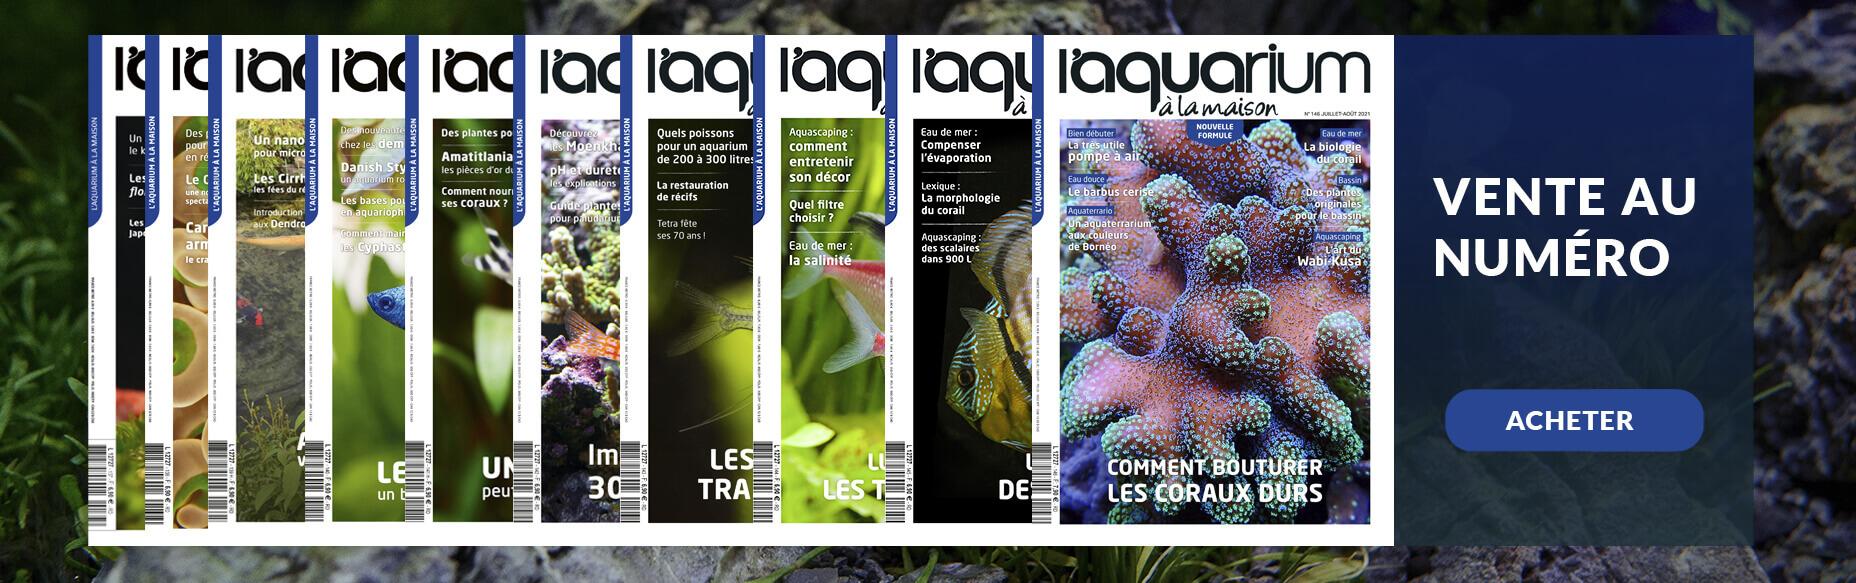 Visuel-Magazines.jpg